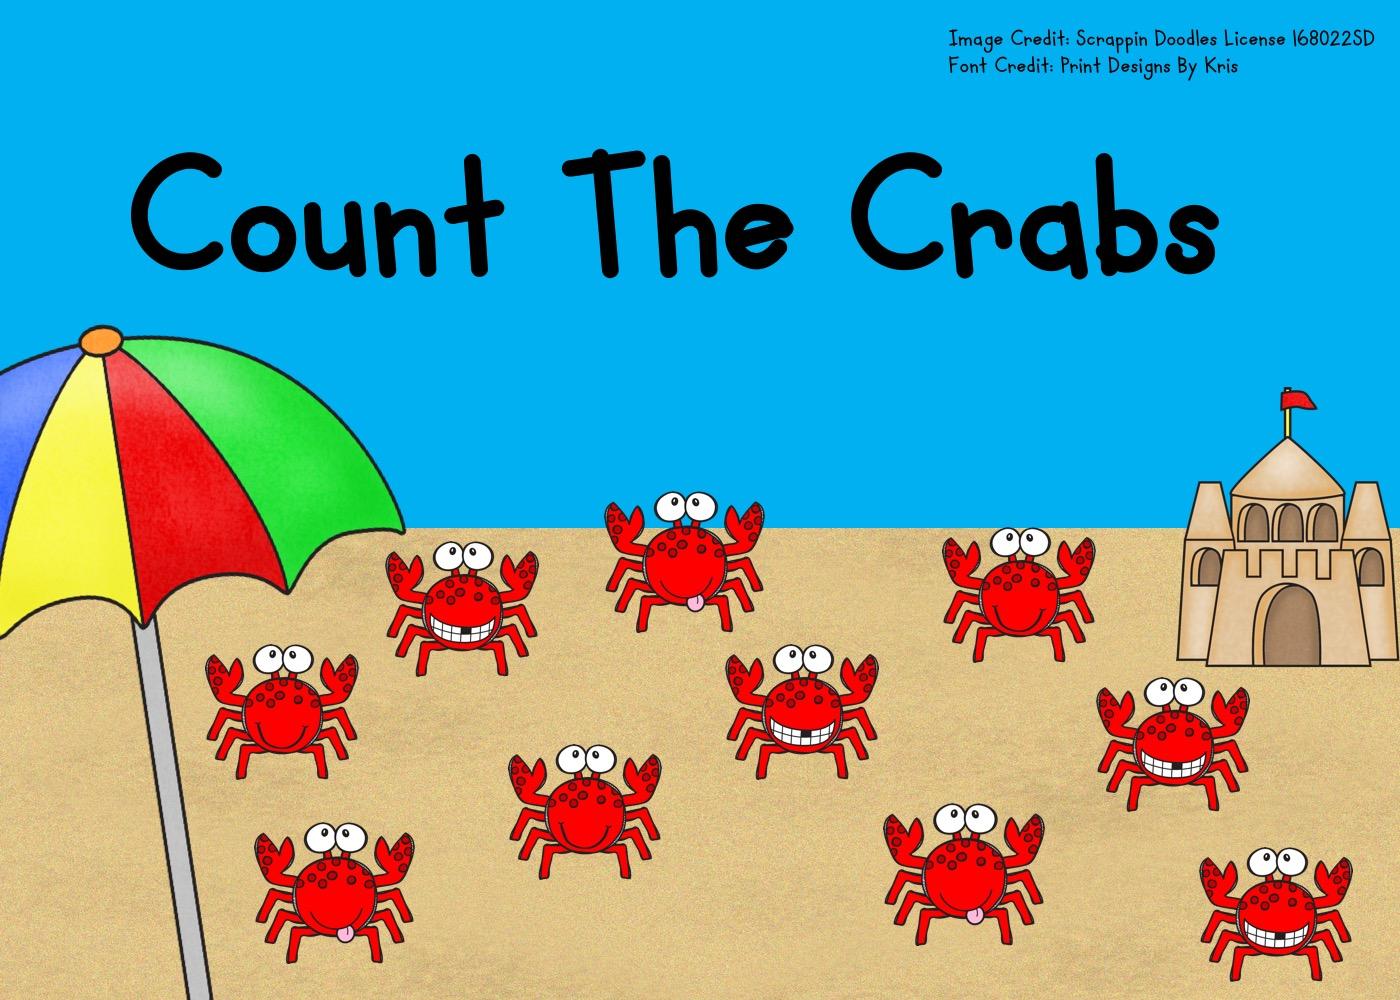 Fun Ocean Printables for Preschool and Kindergarten | Summer Themed Counting Games | Hands On Math Homeschool Activities | Kids Classroom Center Ideas and Worksheets #FreePrintableWorksheetsForKids #crab #ocean #summer #counting